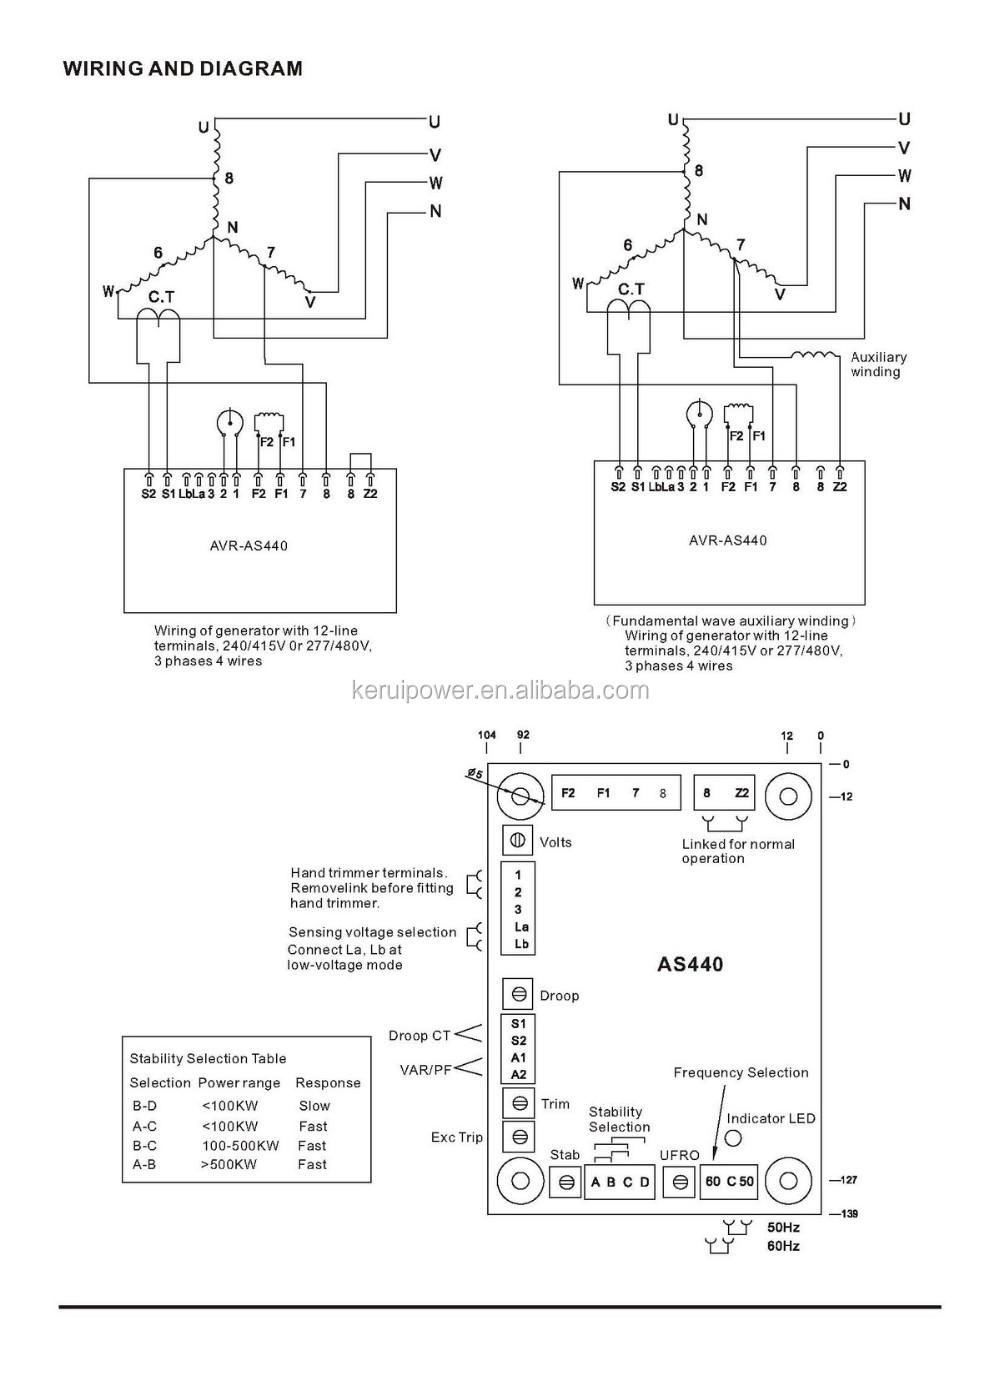 Sx460 Wiring Diagram Diagrams Brushless Alternator Voltage Regulator Wire Center U2022 Stamford Avr Of